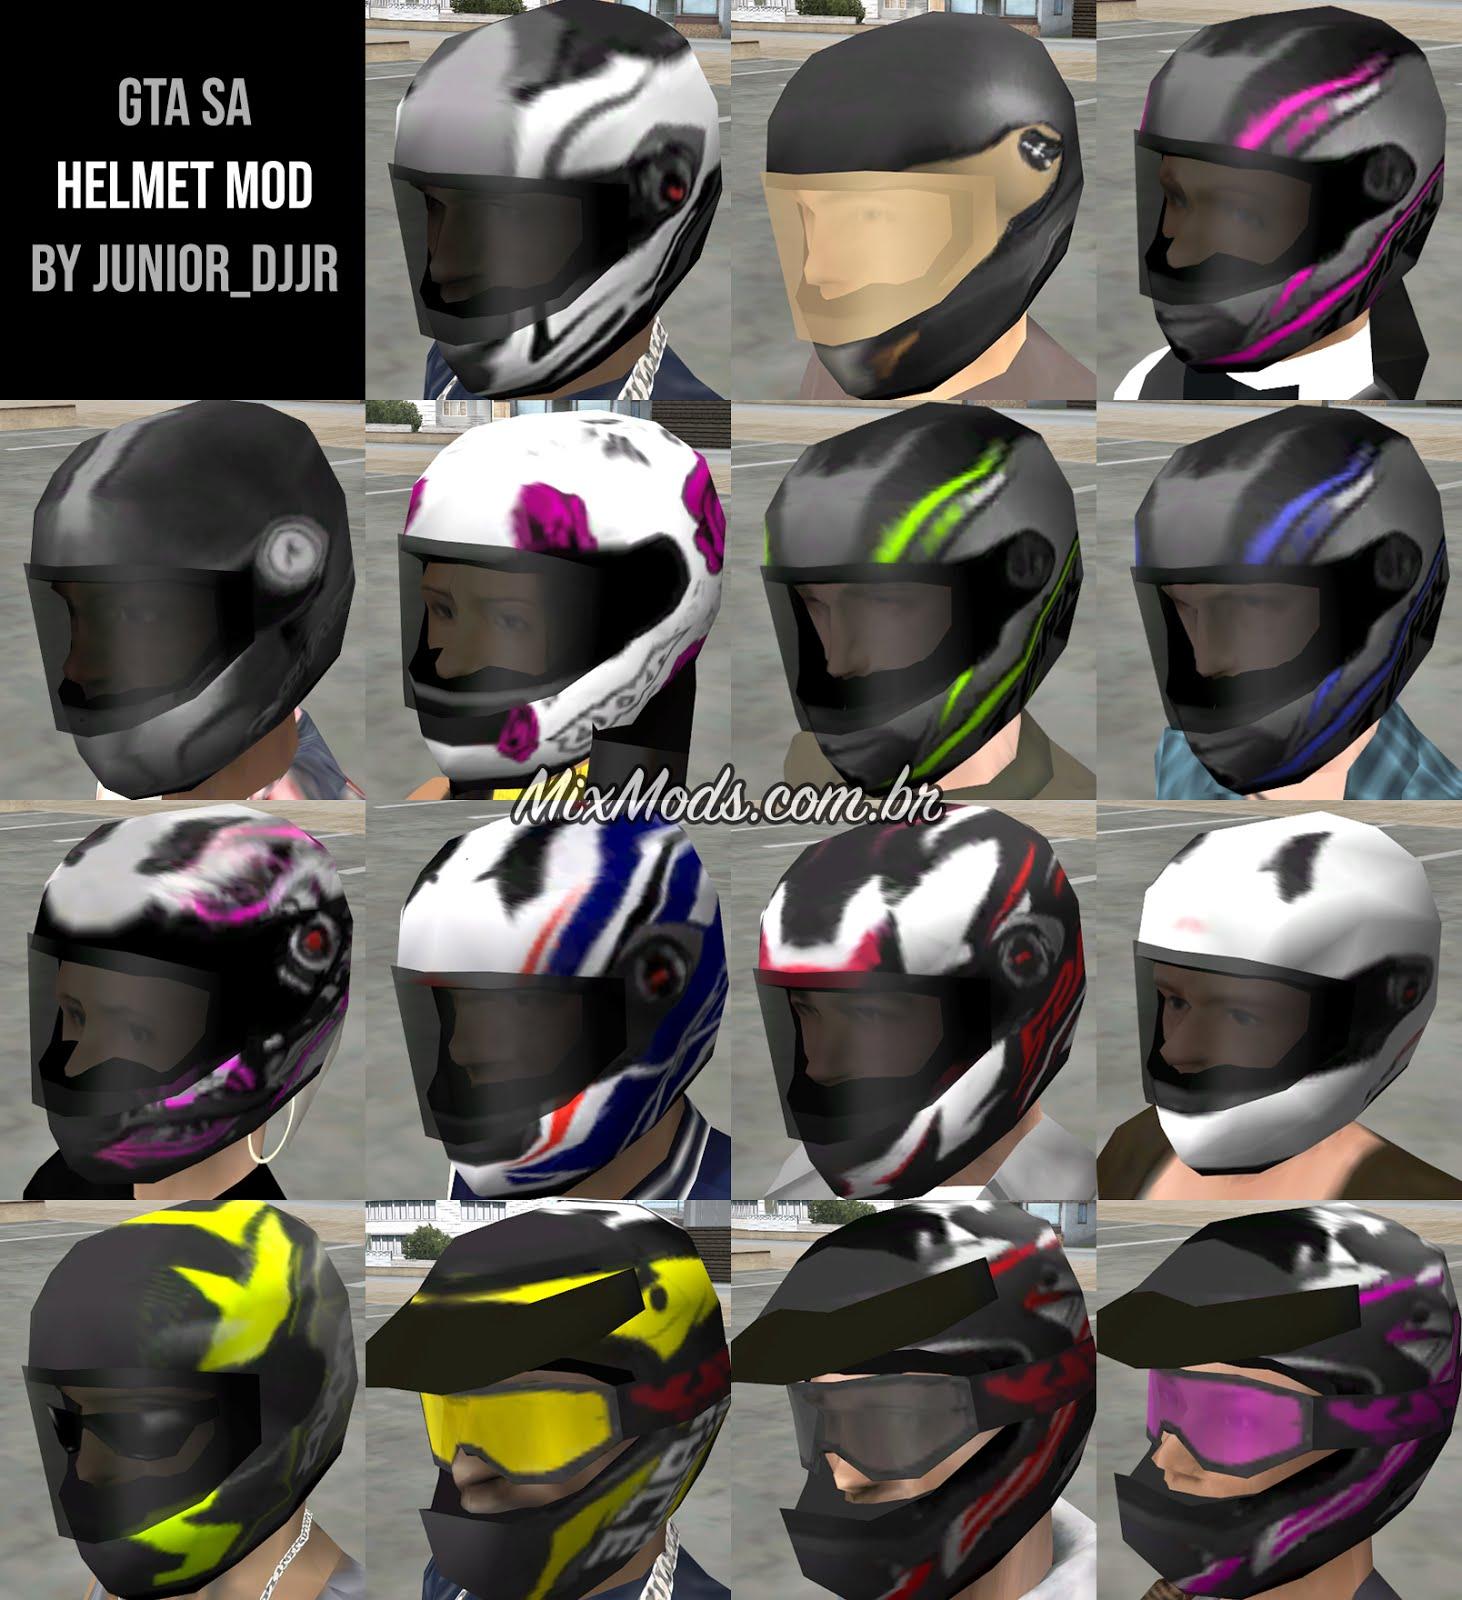 gta-sa-helmet-mod-npcs-capacete.jpg